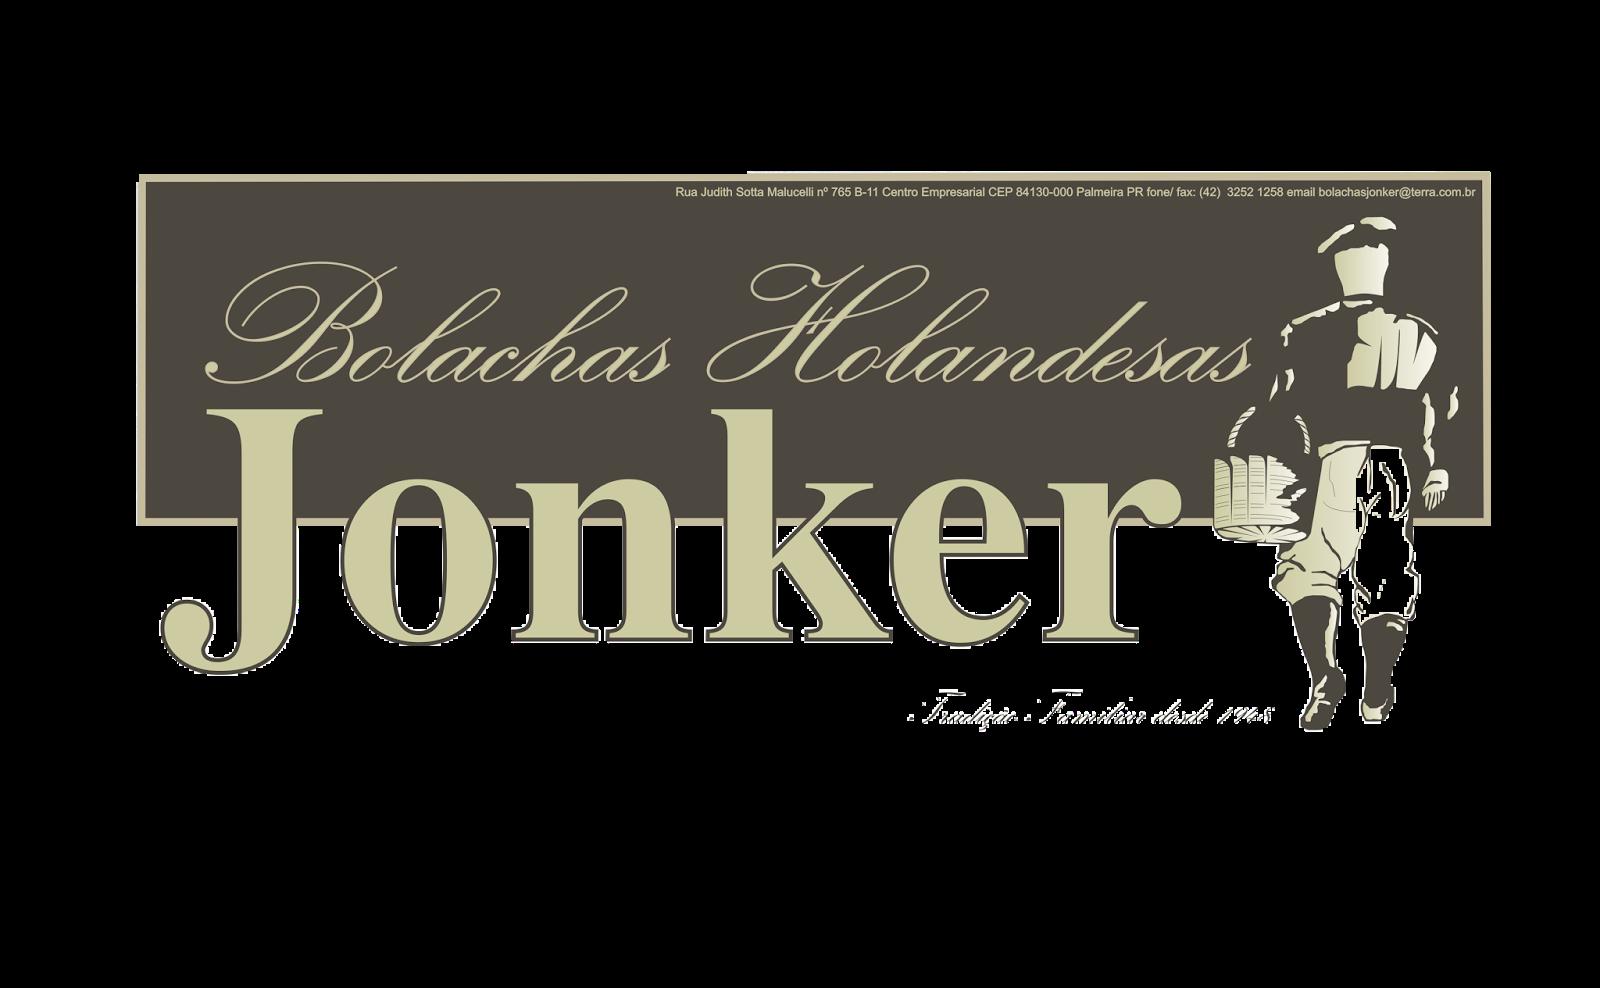 bolachas holandesas jonker ... blog Mamãe de Salto